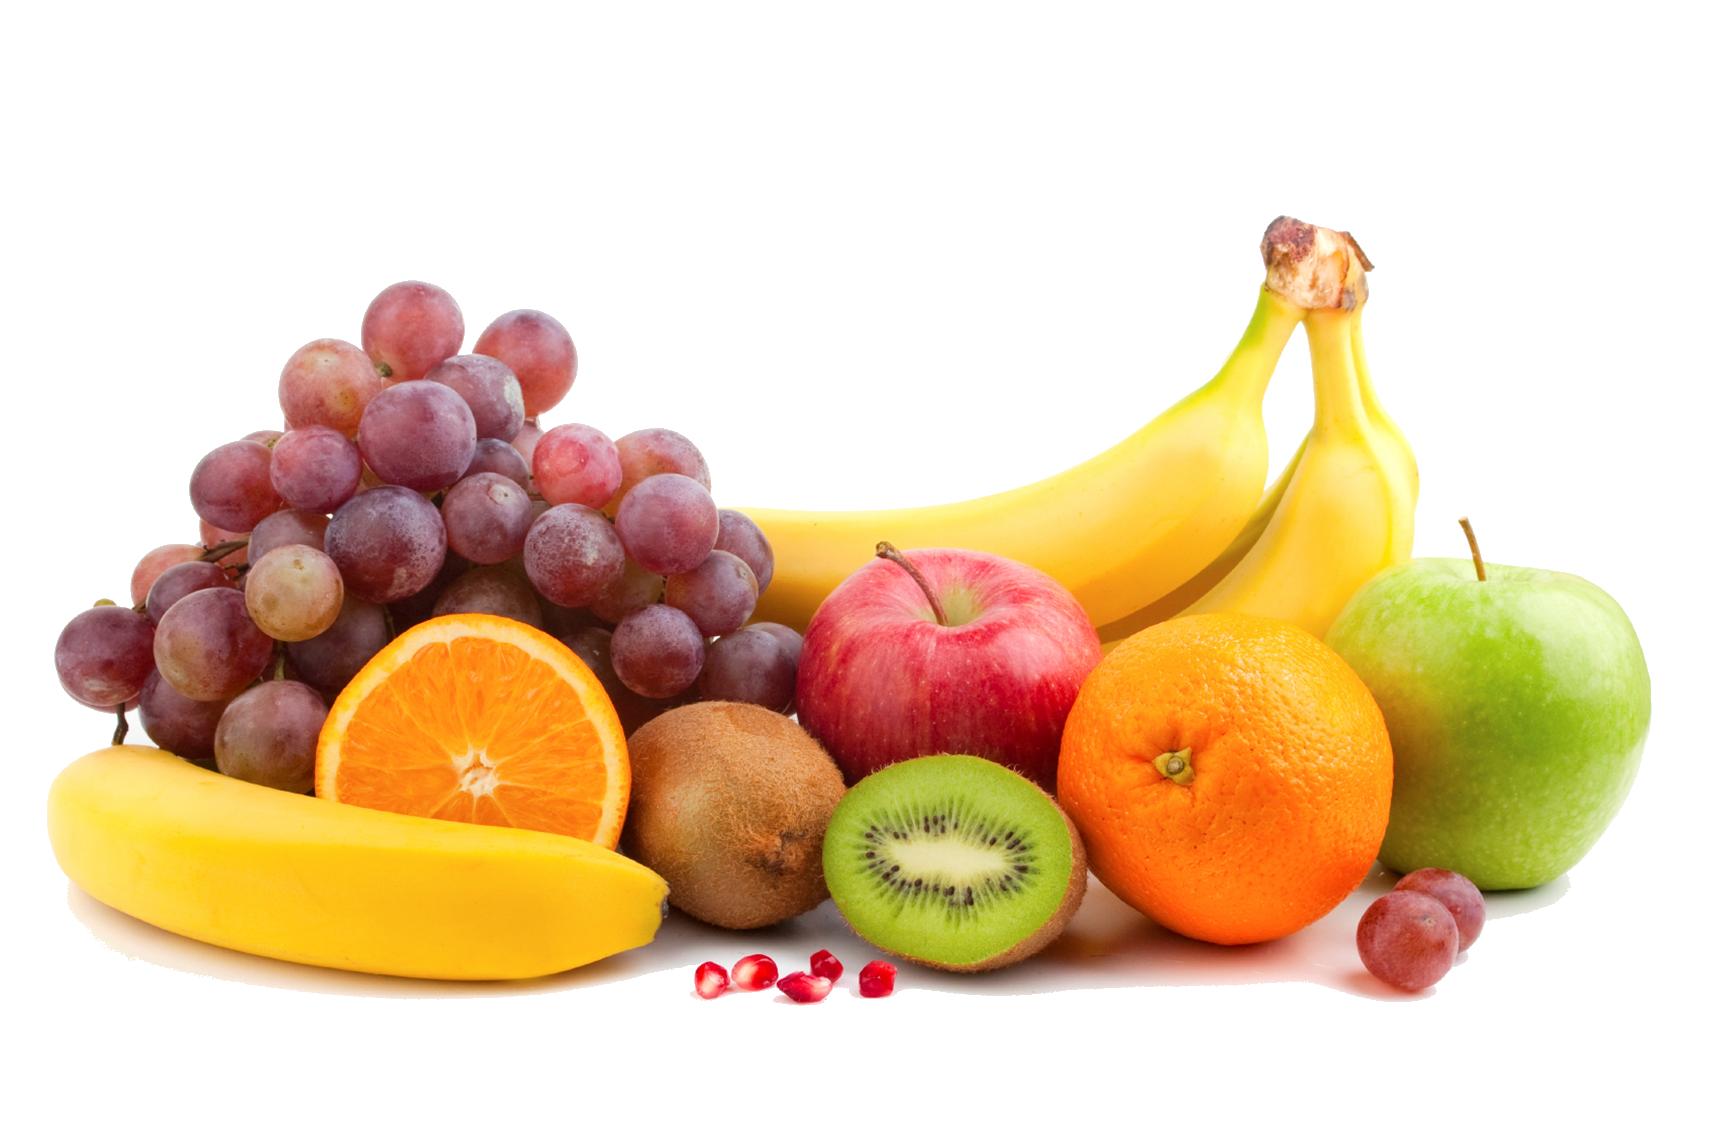 Png transparent images all. Fruit clipart buko